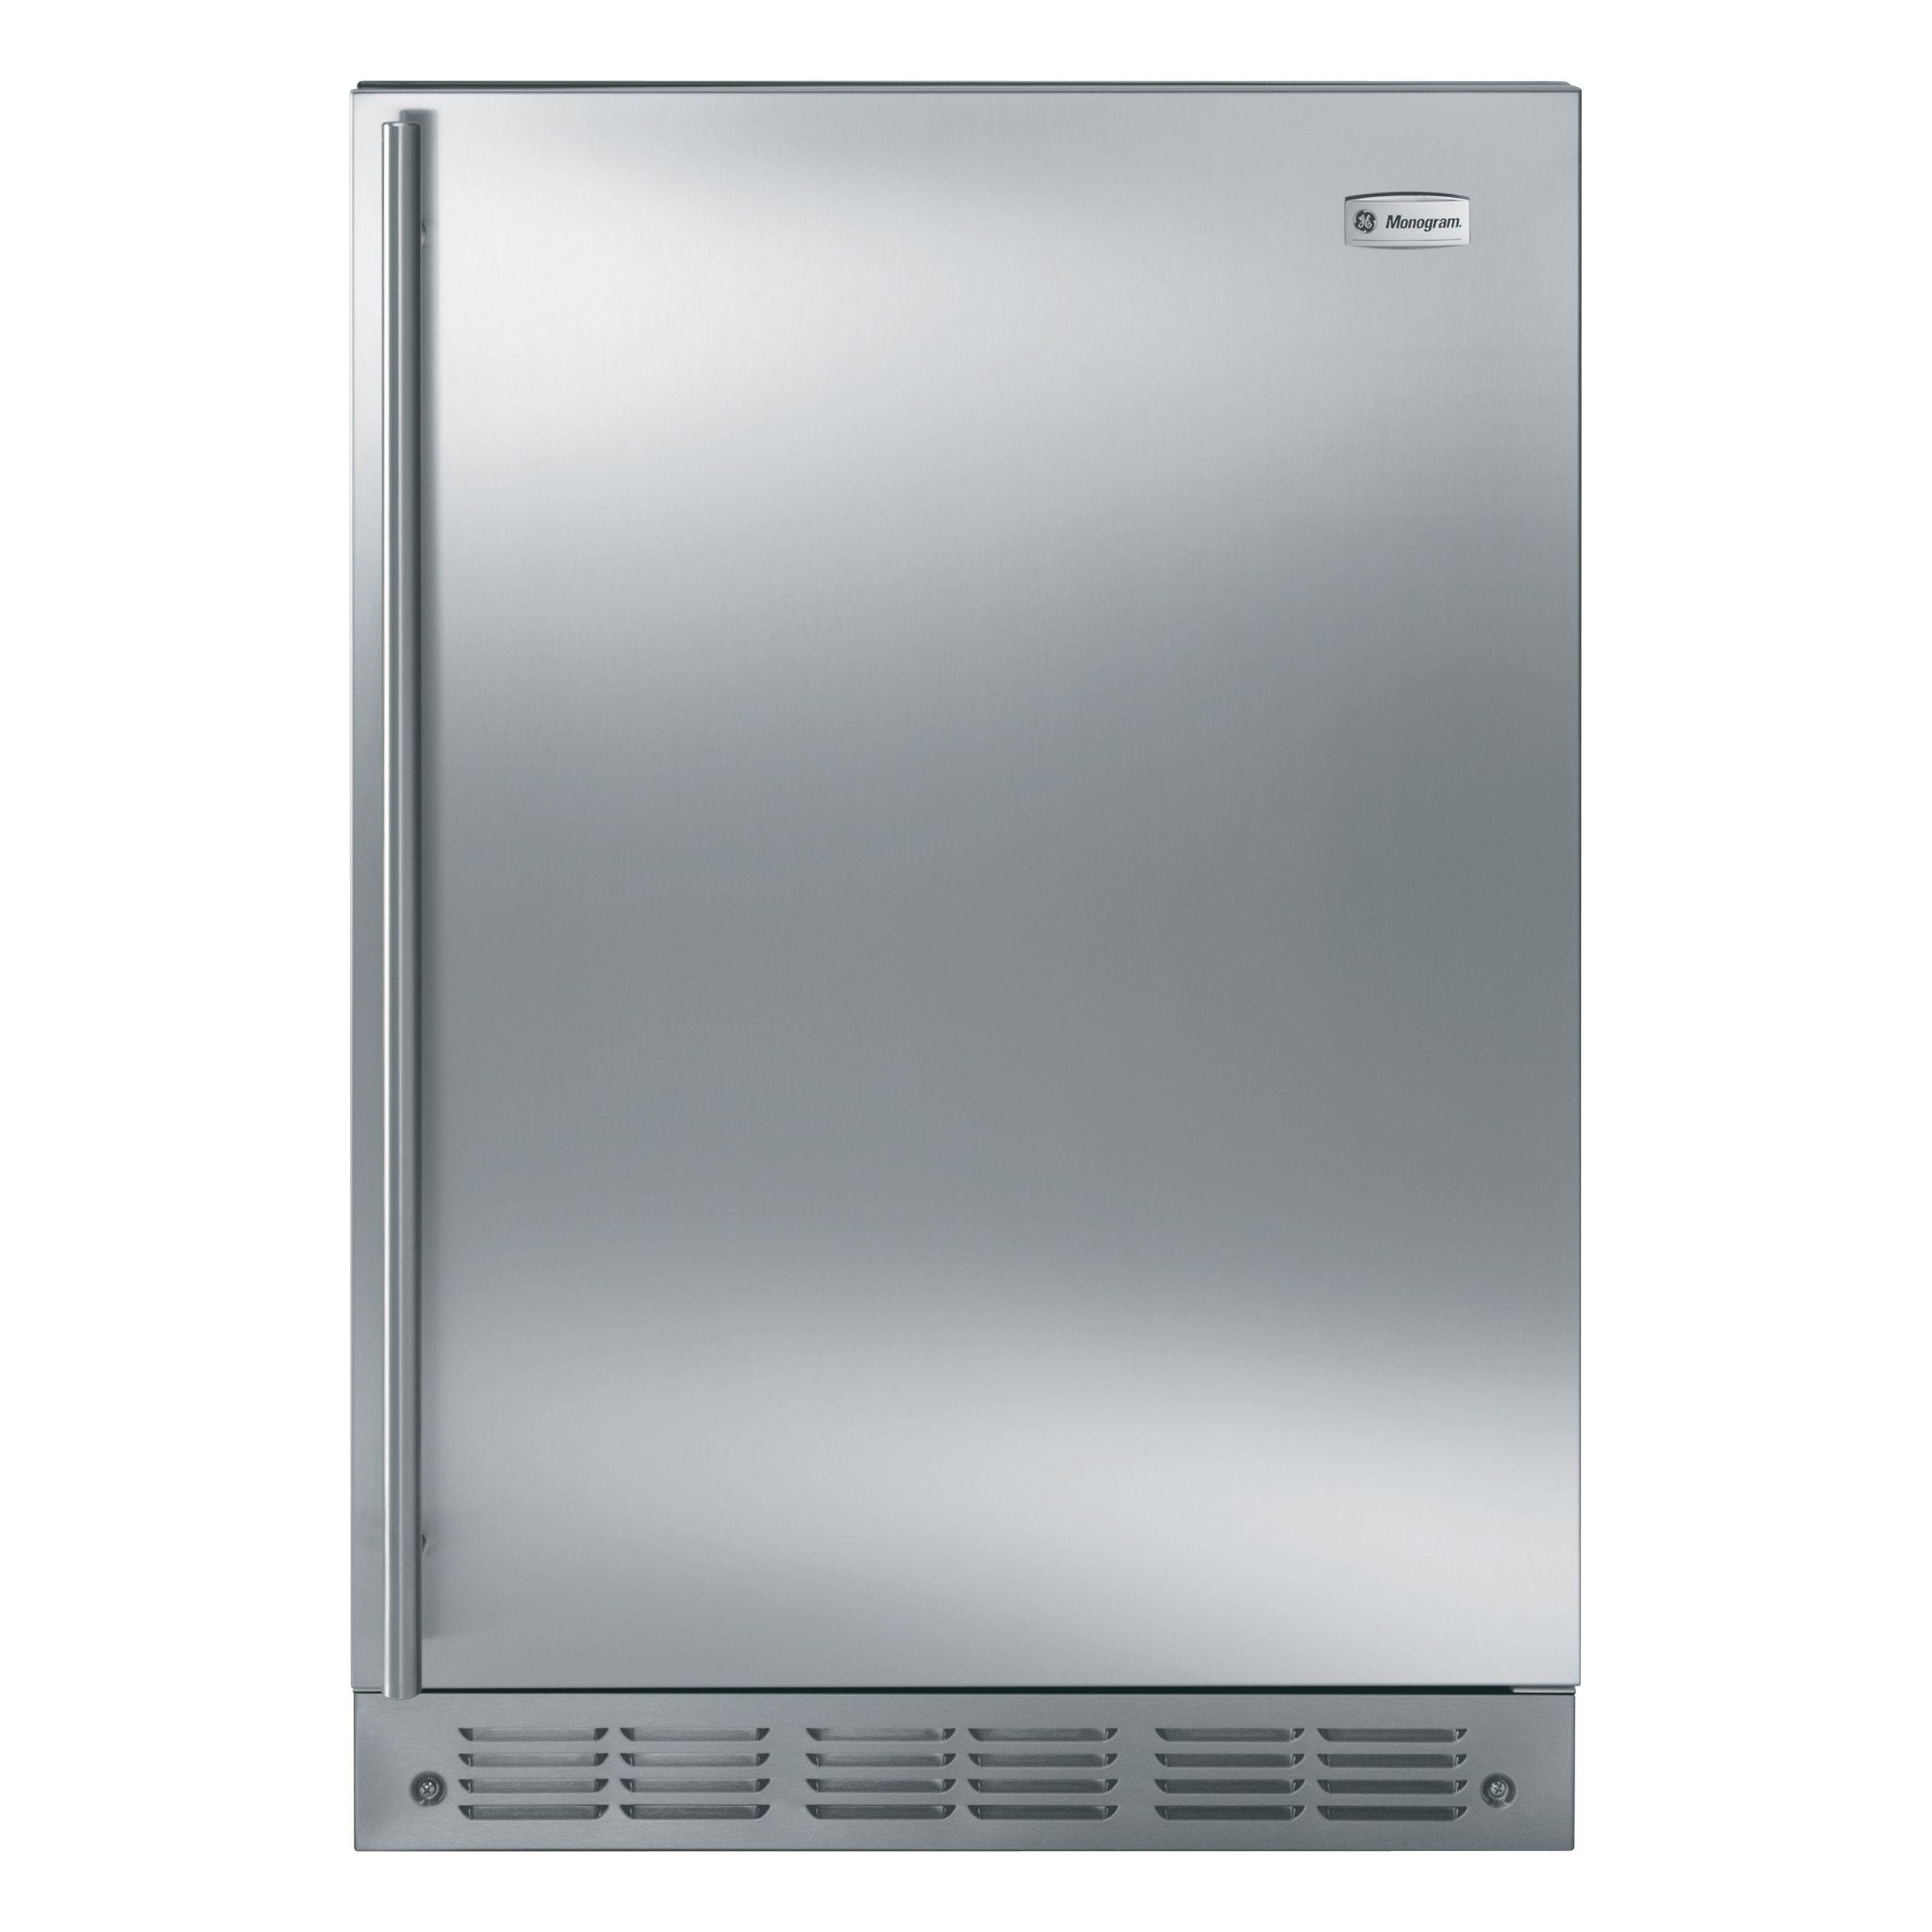 Ge Monogram 24 In Bar Refrigerator W Icemaker